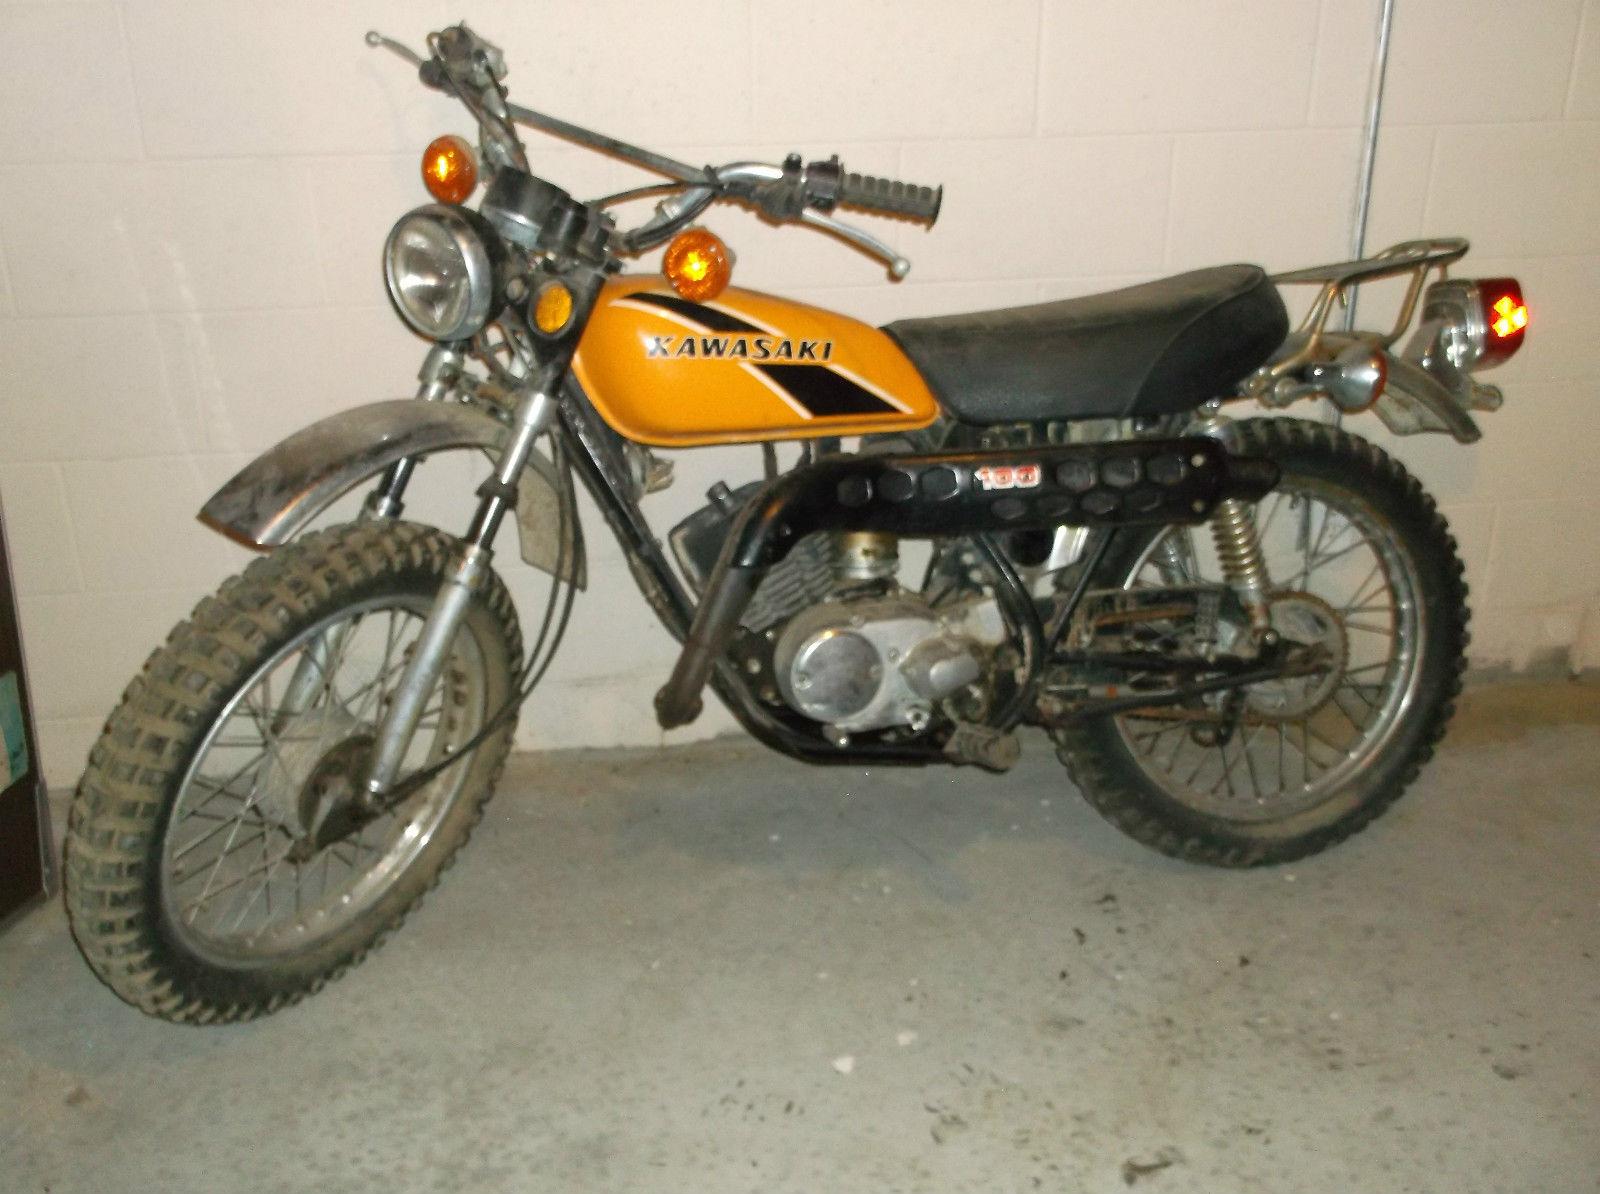 1974 Kawasaki G4 100 trail boss